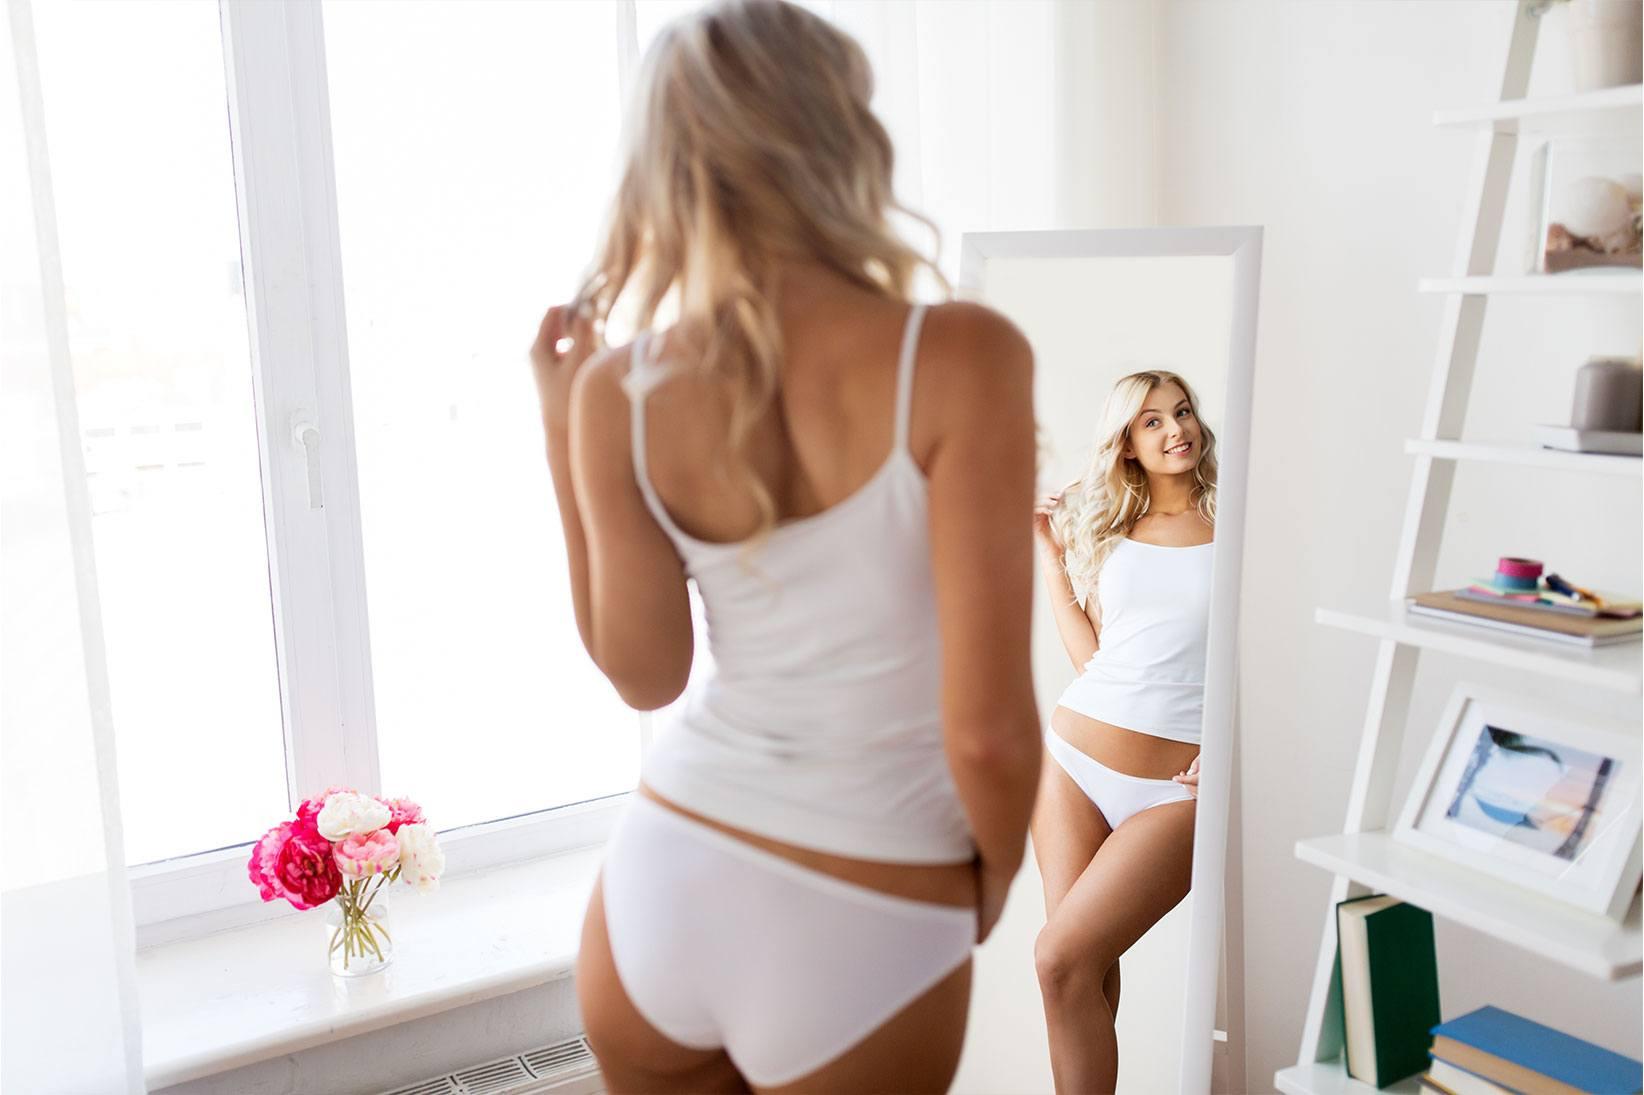 woman-in-mirror-white